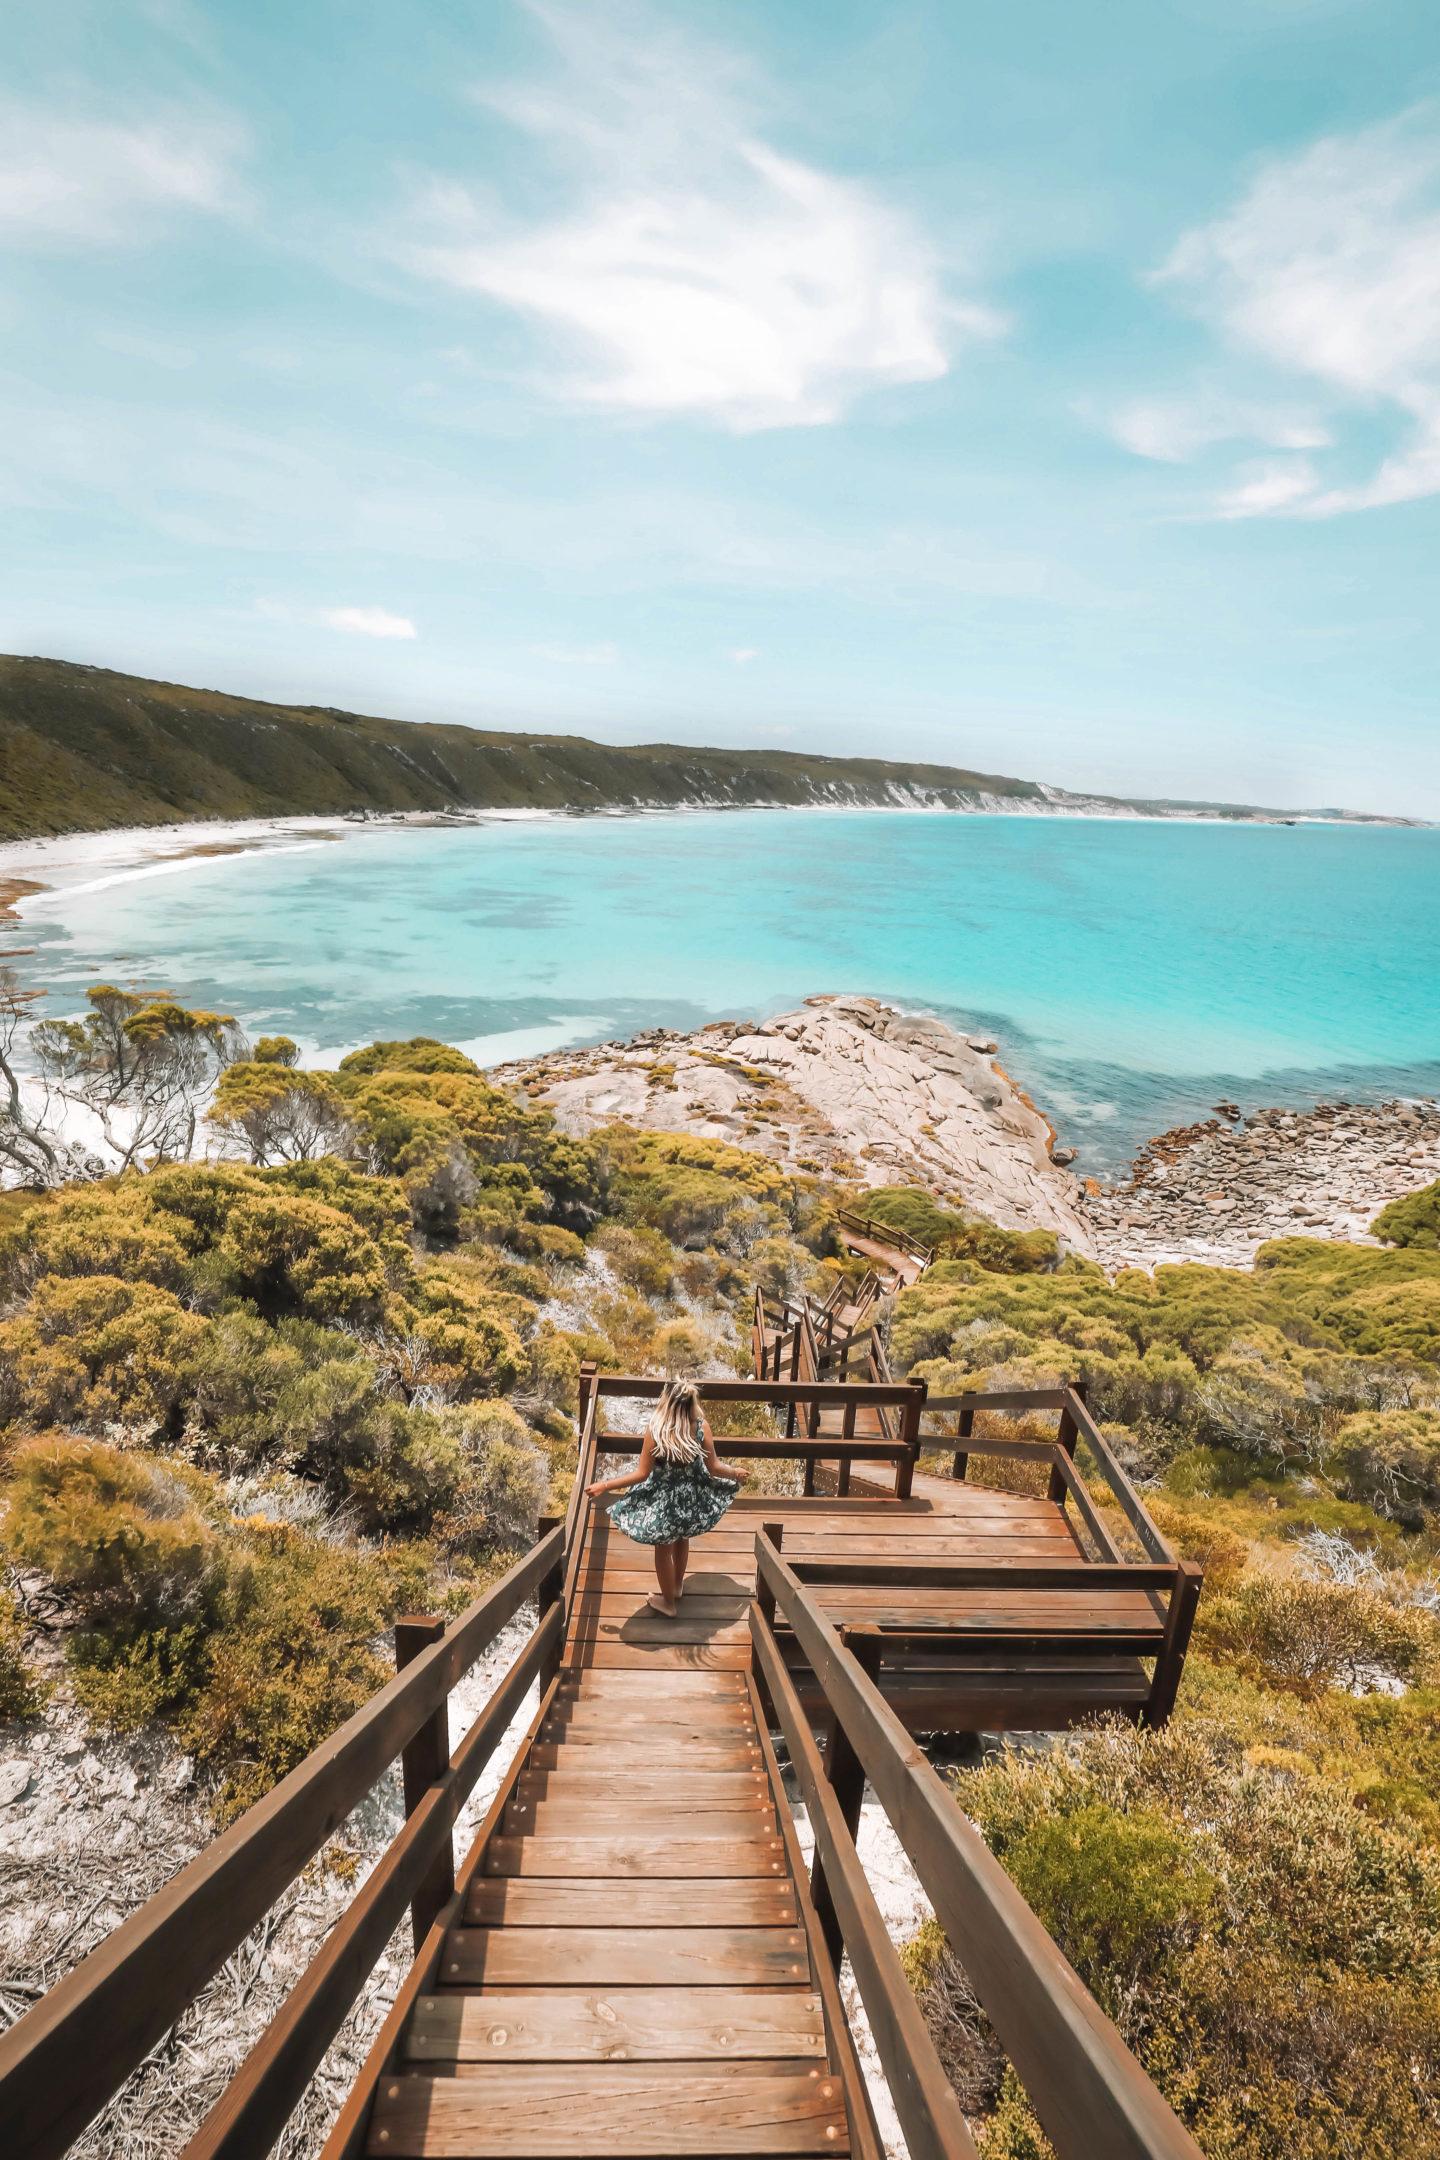 Visiter Esperance, Australie - Blondie Baby blog mode et voyages